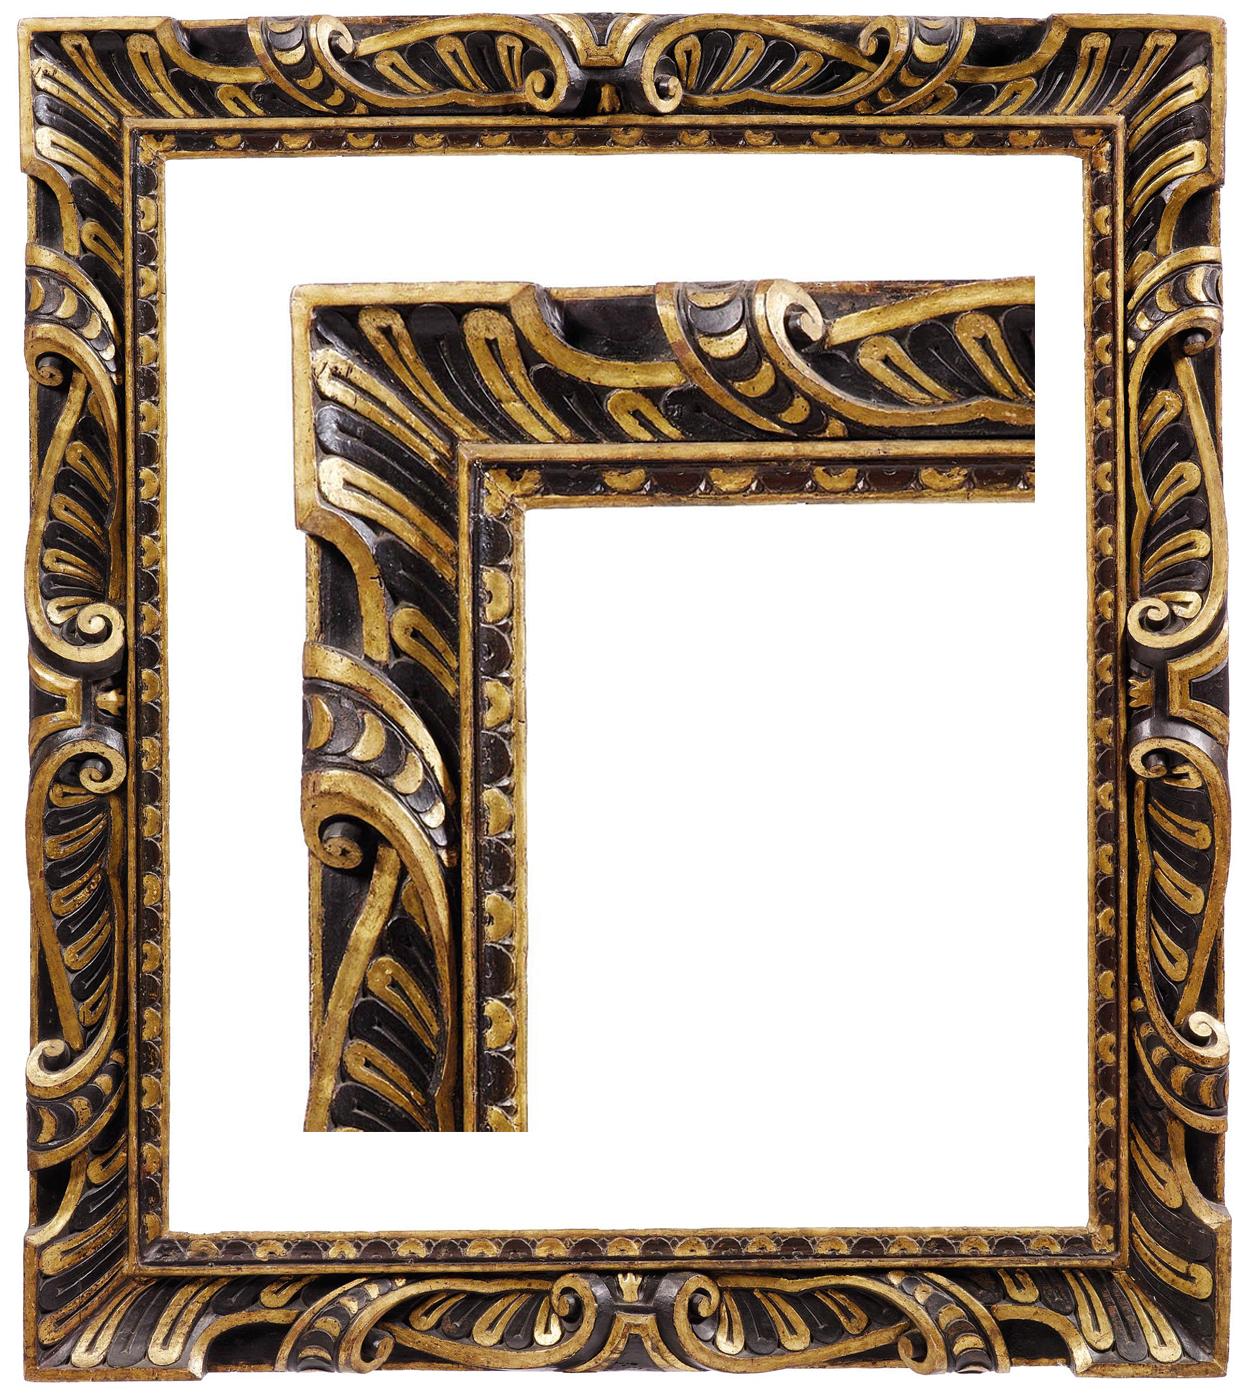 Antique frame auction | The Frame Blog